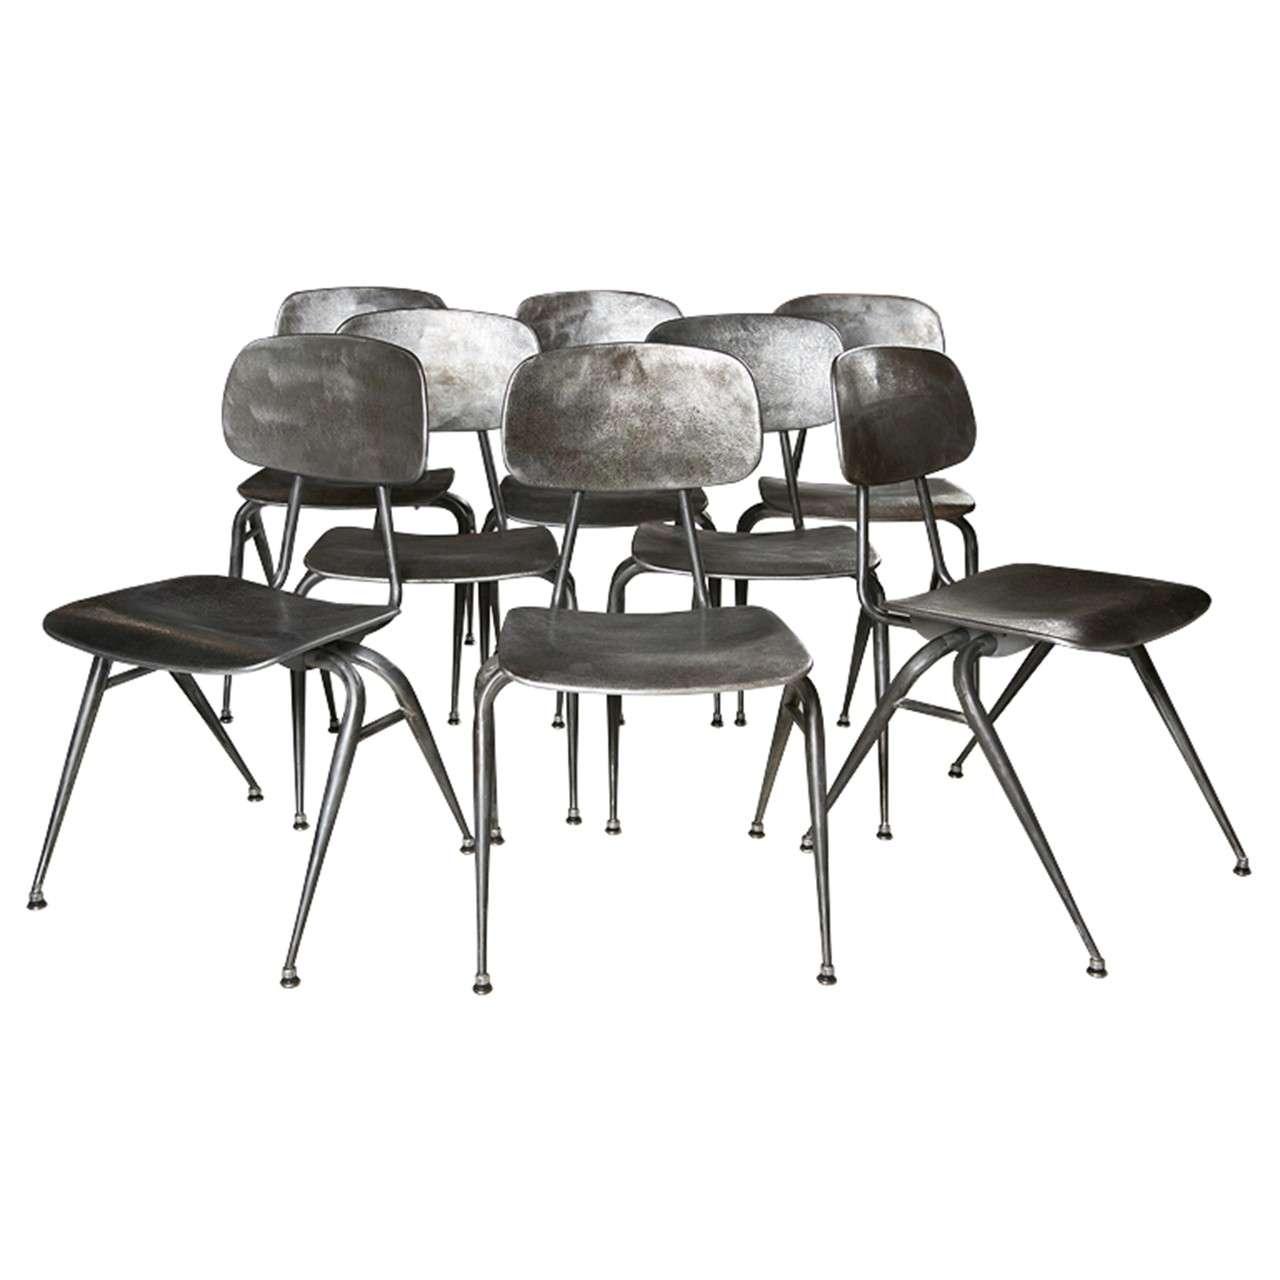 Mid century modern metal chairs at 1stdibs